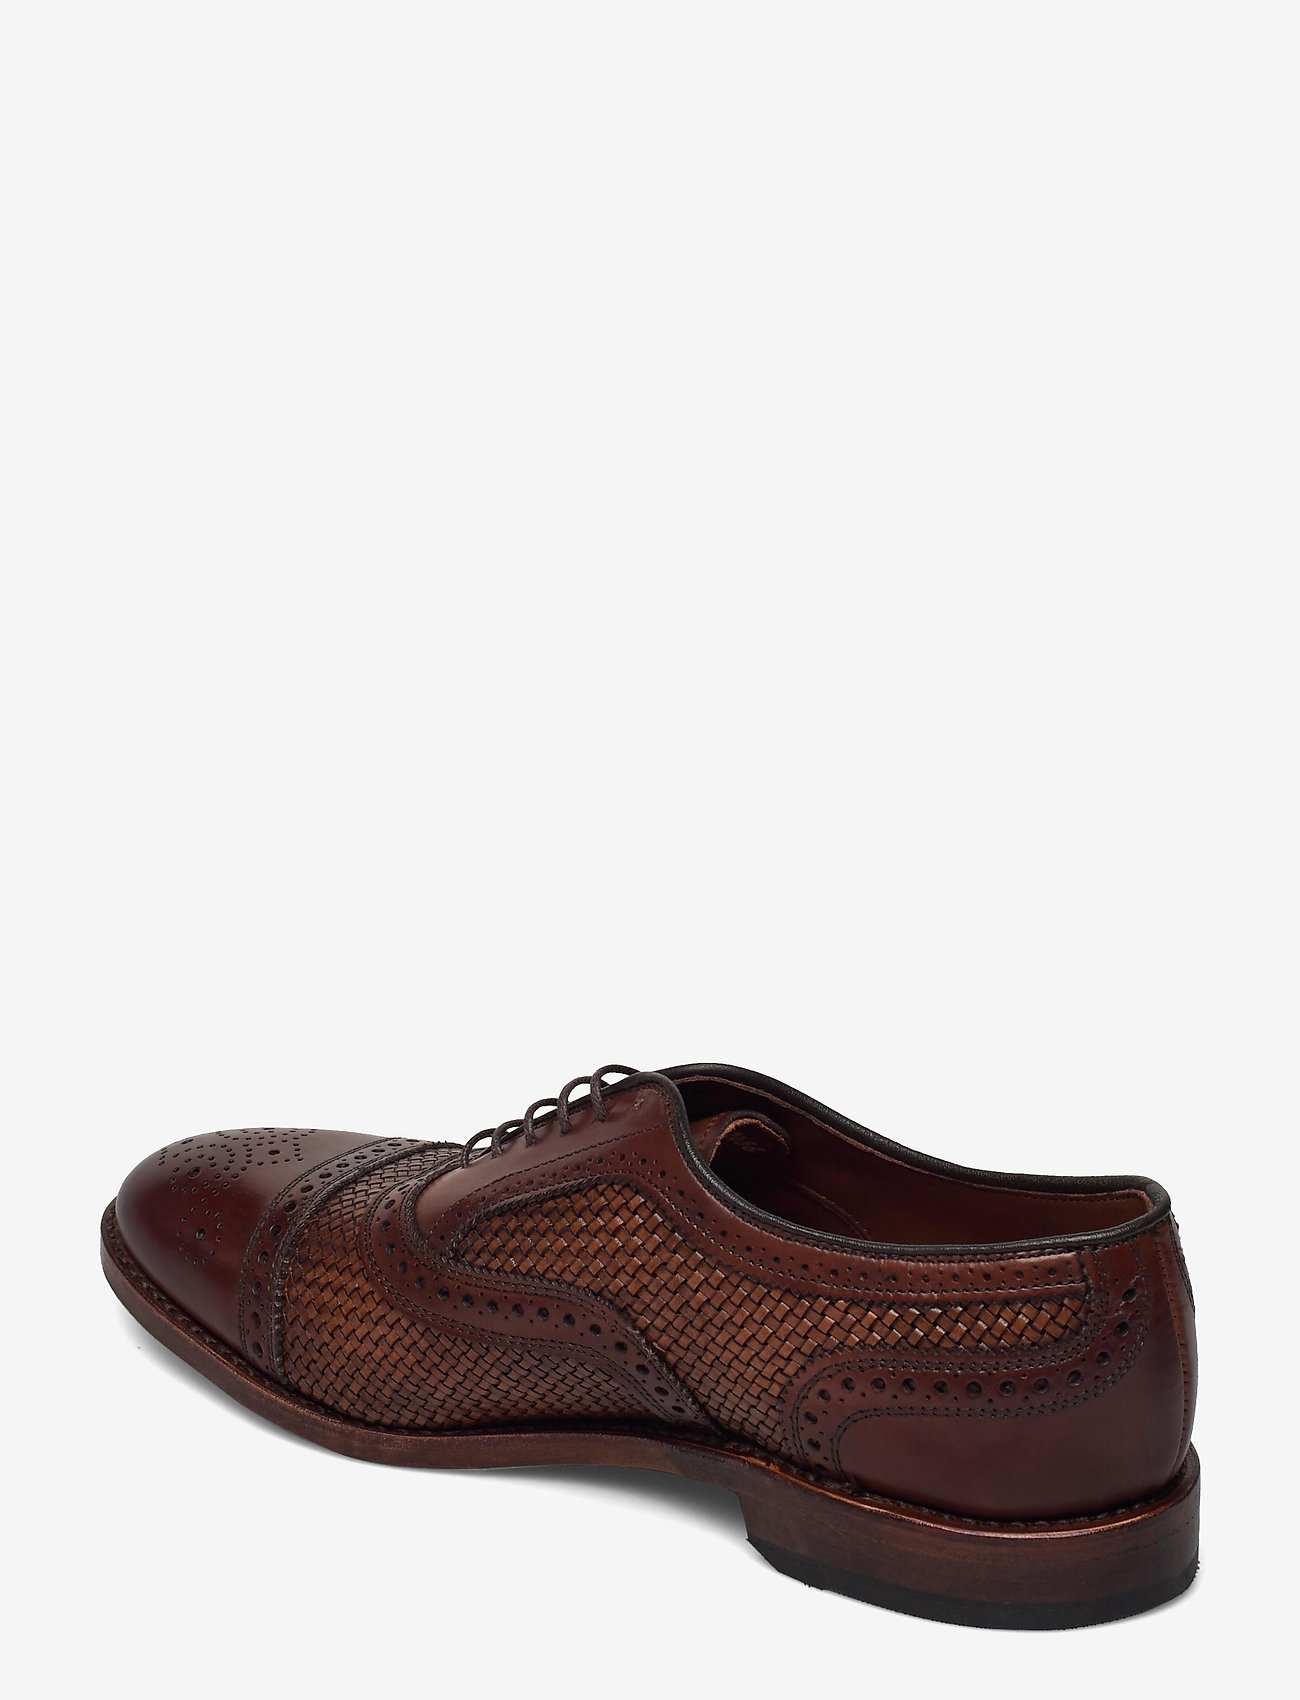 Allen Edmonds - Strand Weave - business - chili - 2